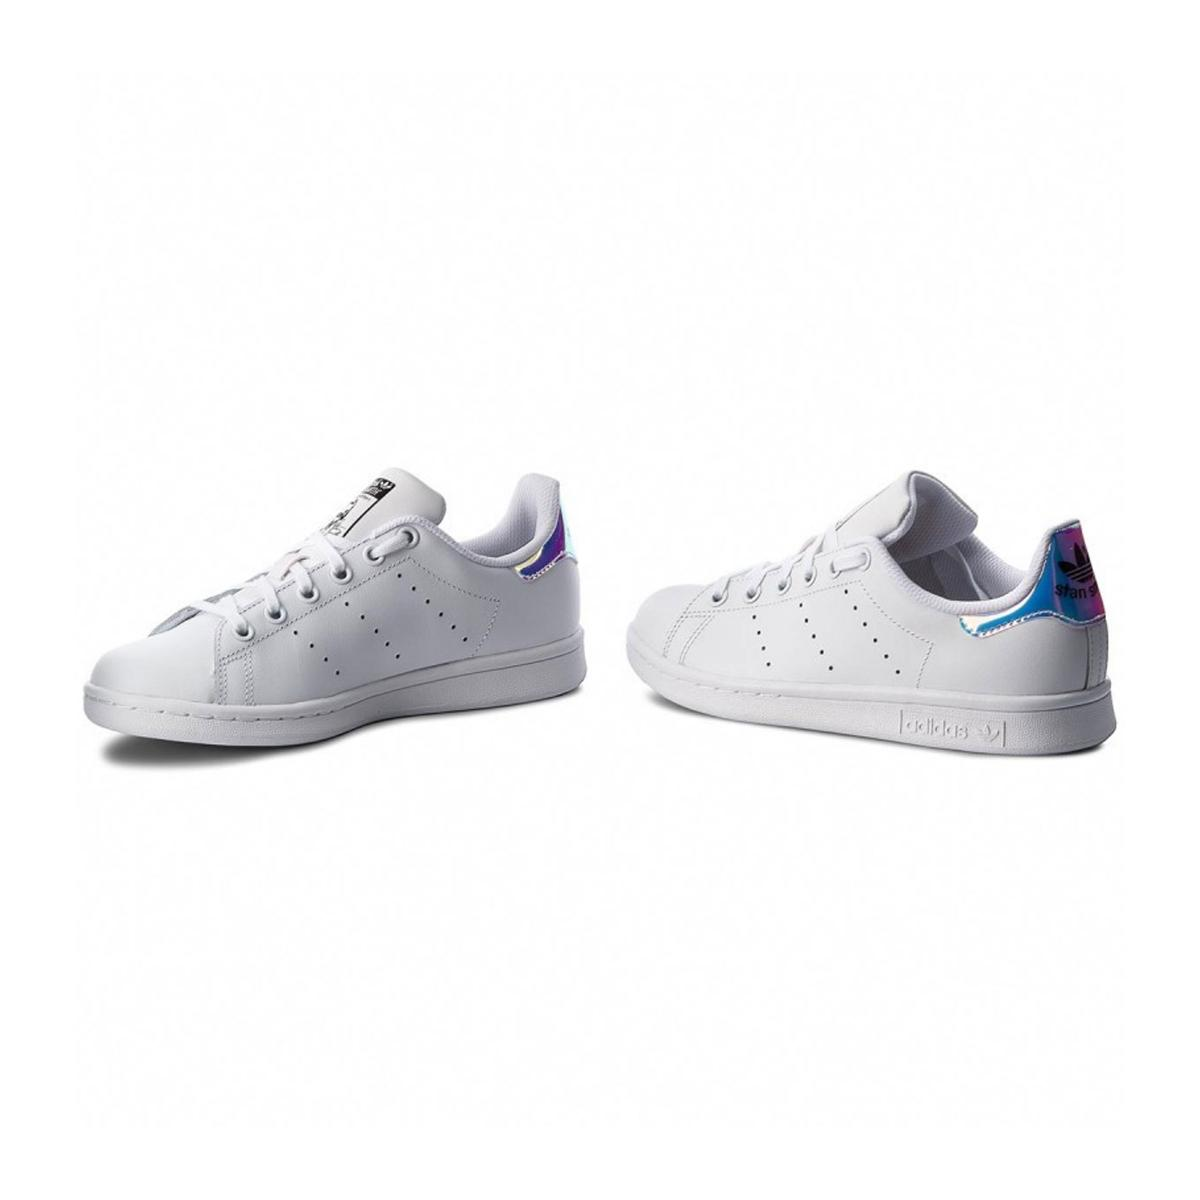 Scarpe Sneakers Adidas Stan Smith J da ragazza rif. AQ6272